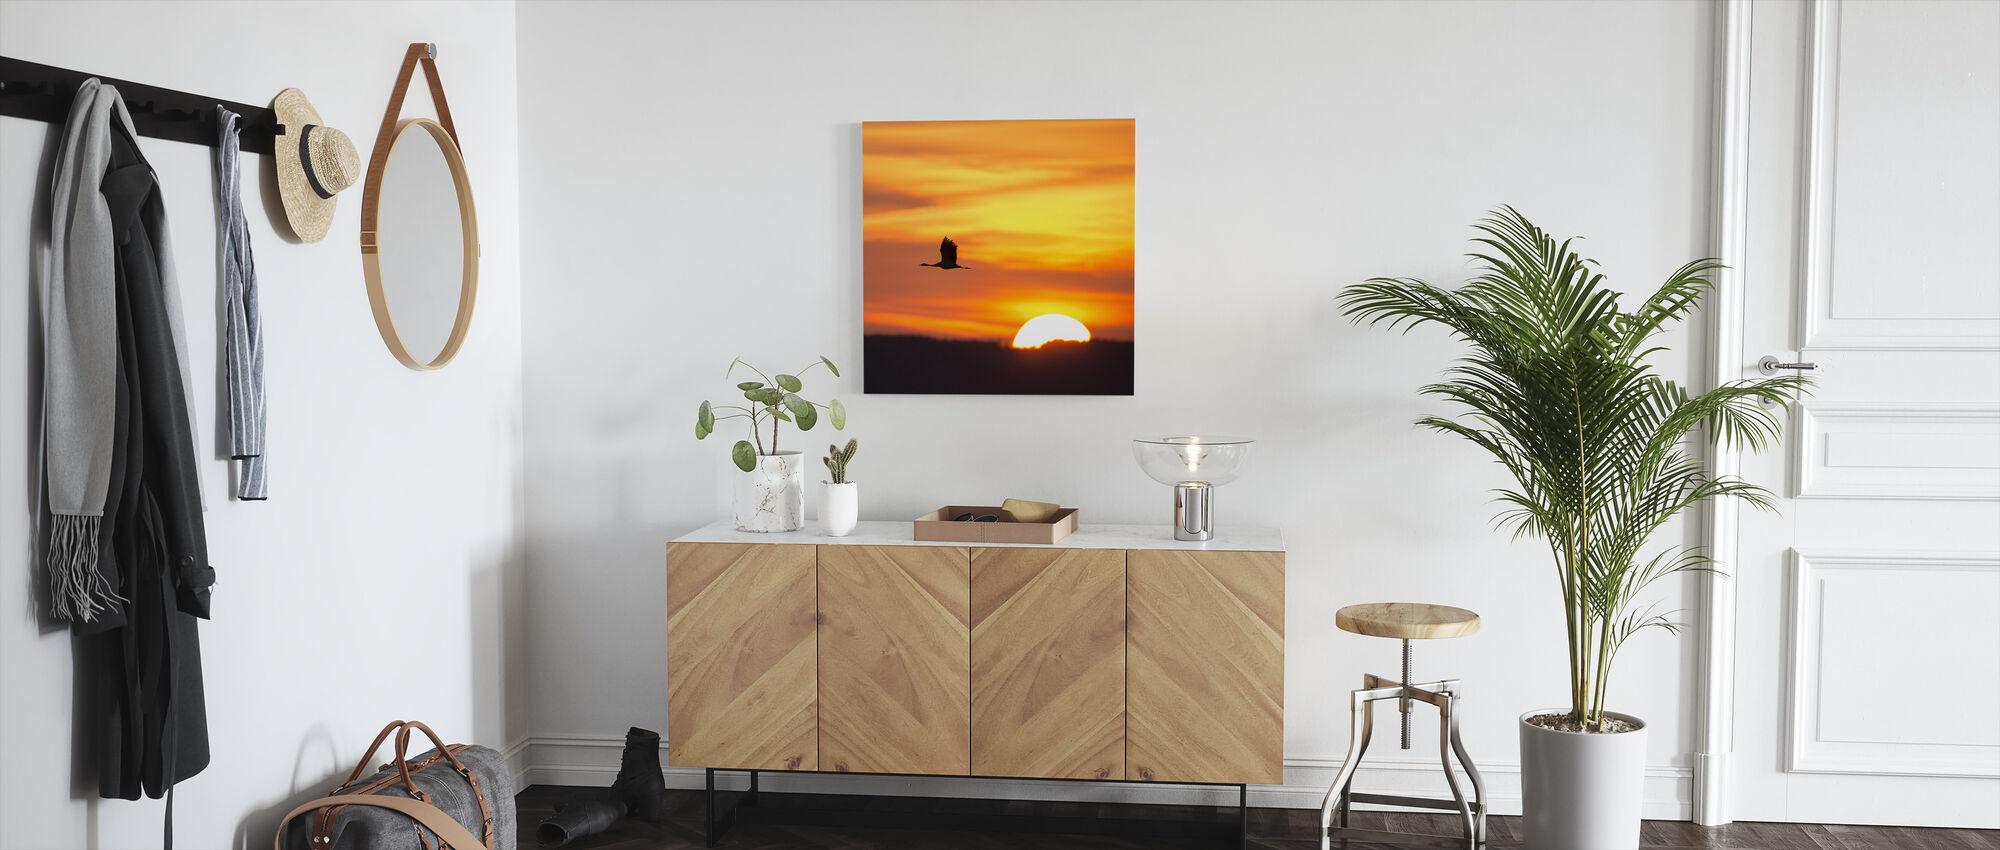 Crane and a Beautiful Sunrise - Canvas print - Hallway